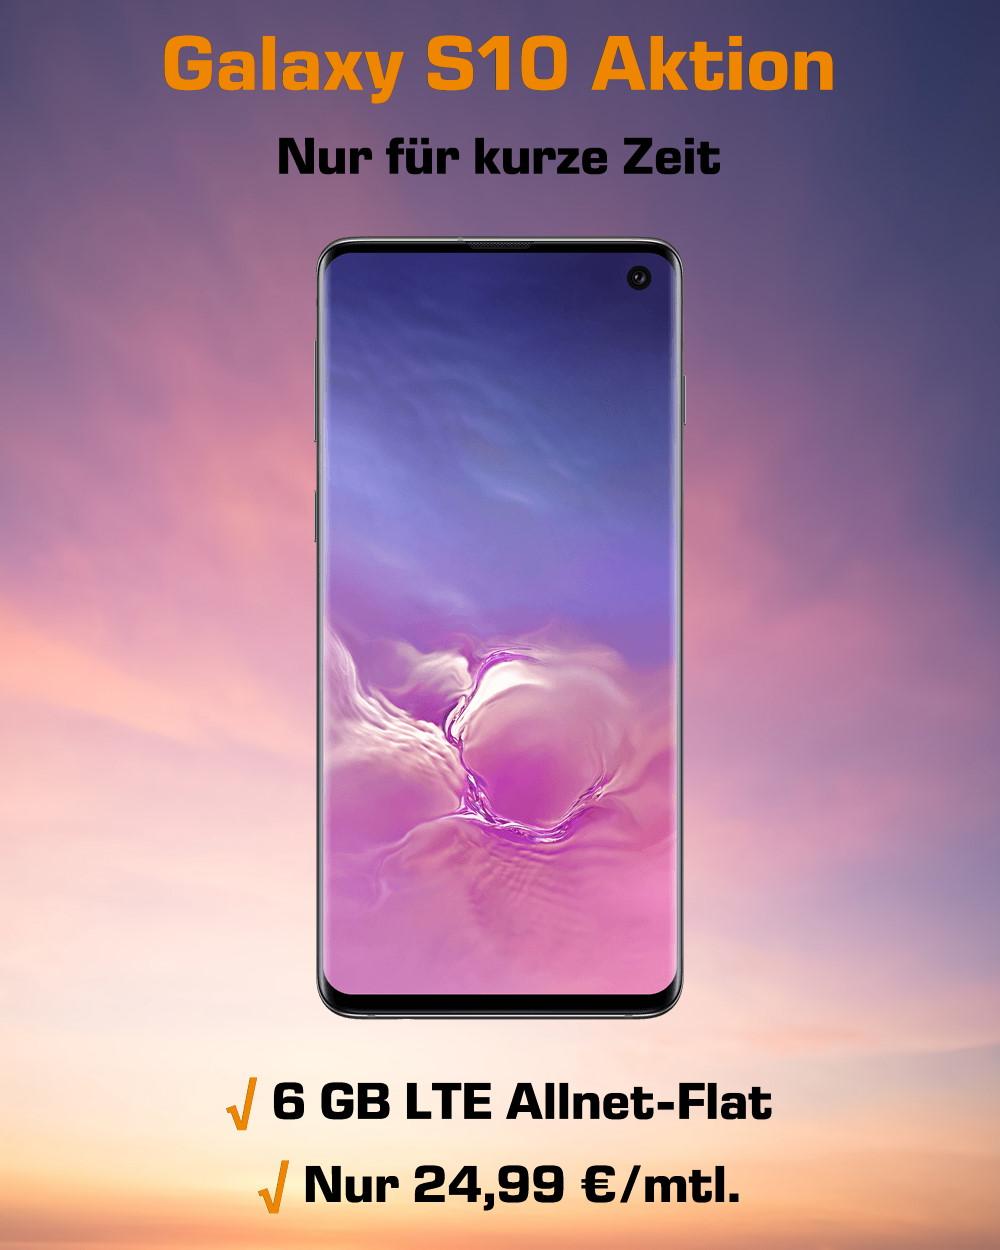 Galaxy S10 mit 6 GB LTE Allnet-Flat zum Mega-Tiefpreis